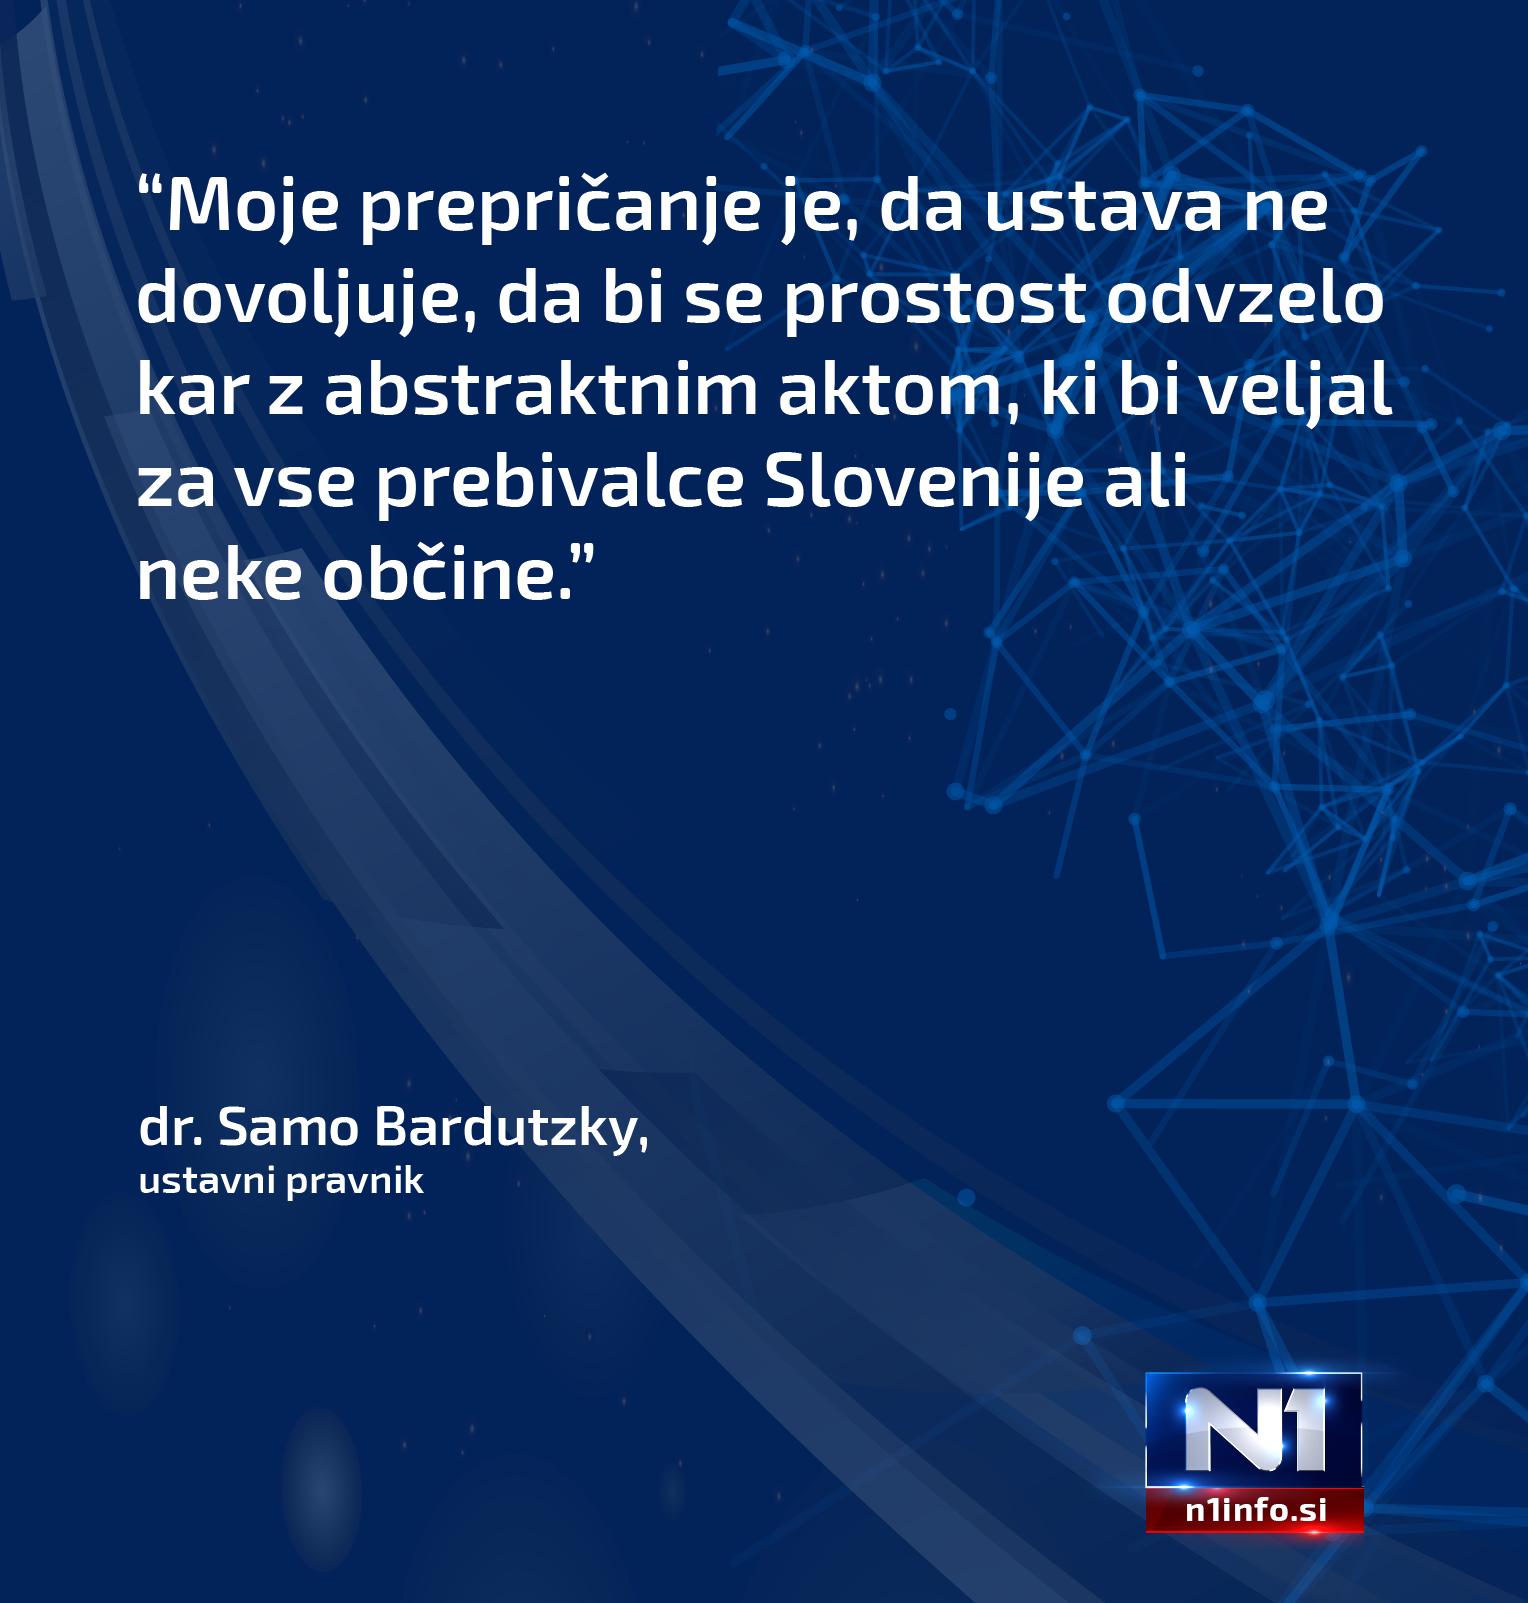 Samo Bardutzky citat